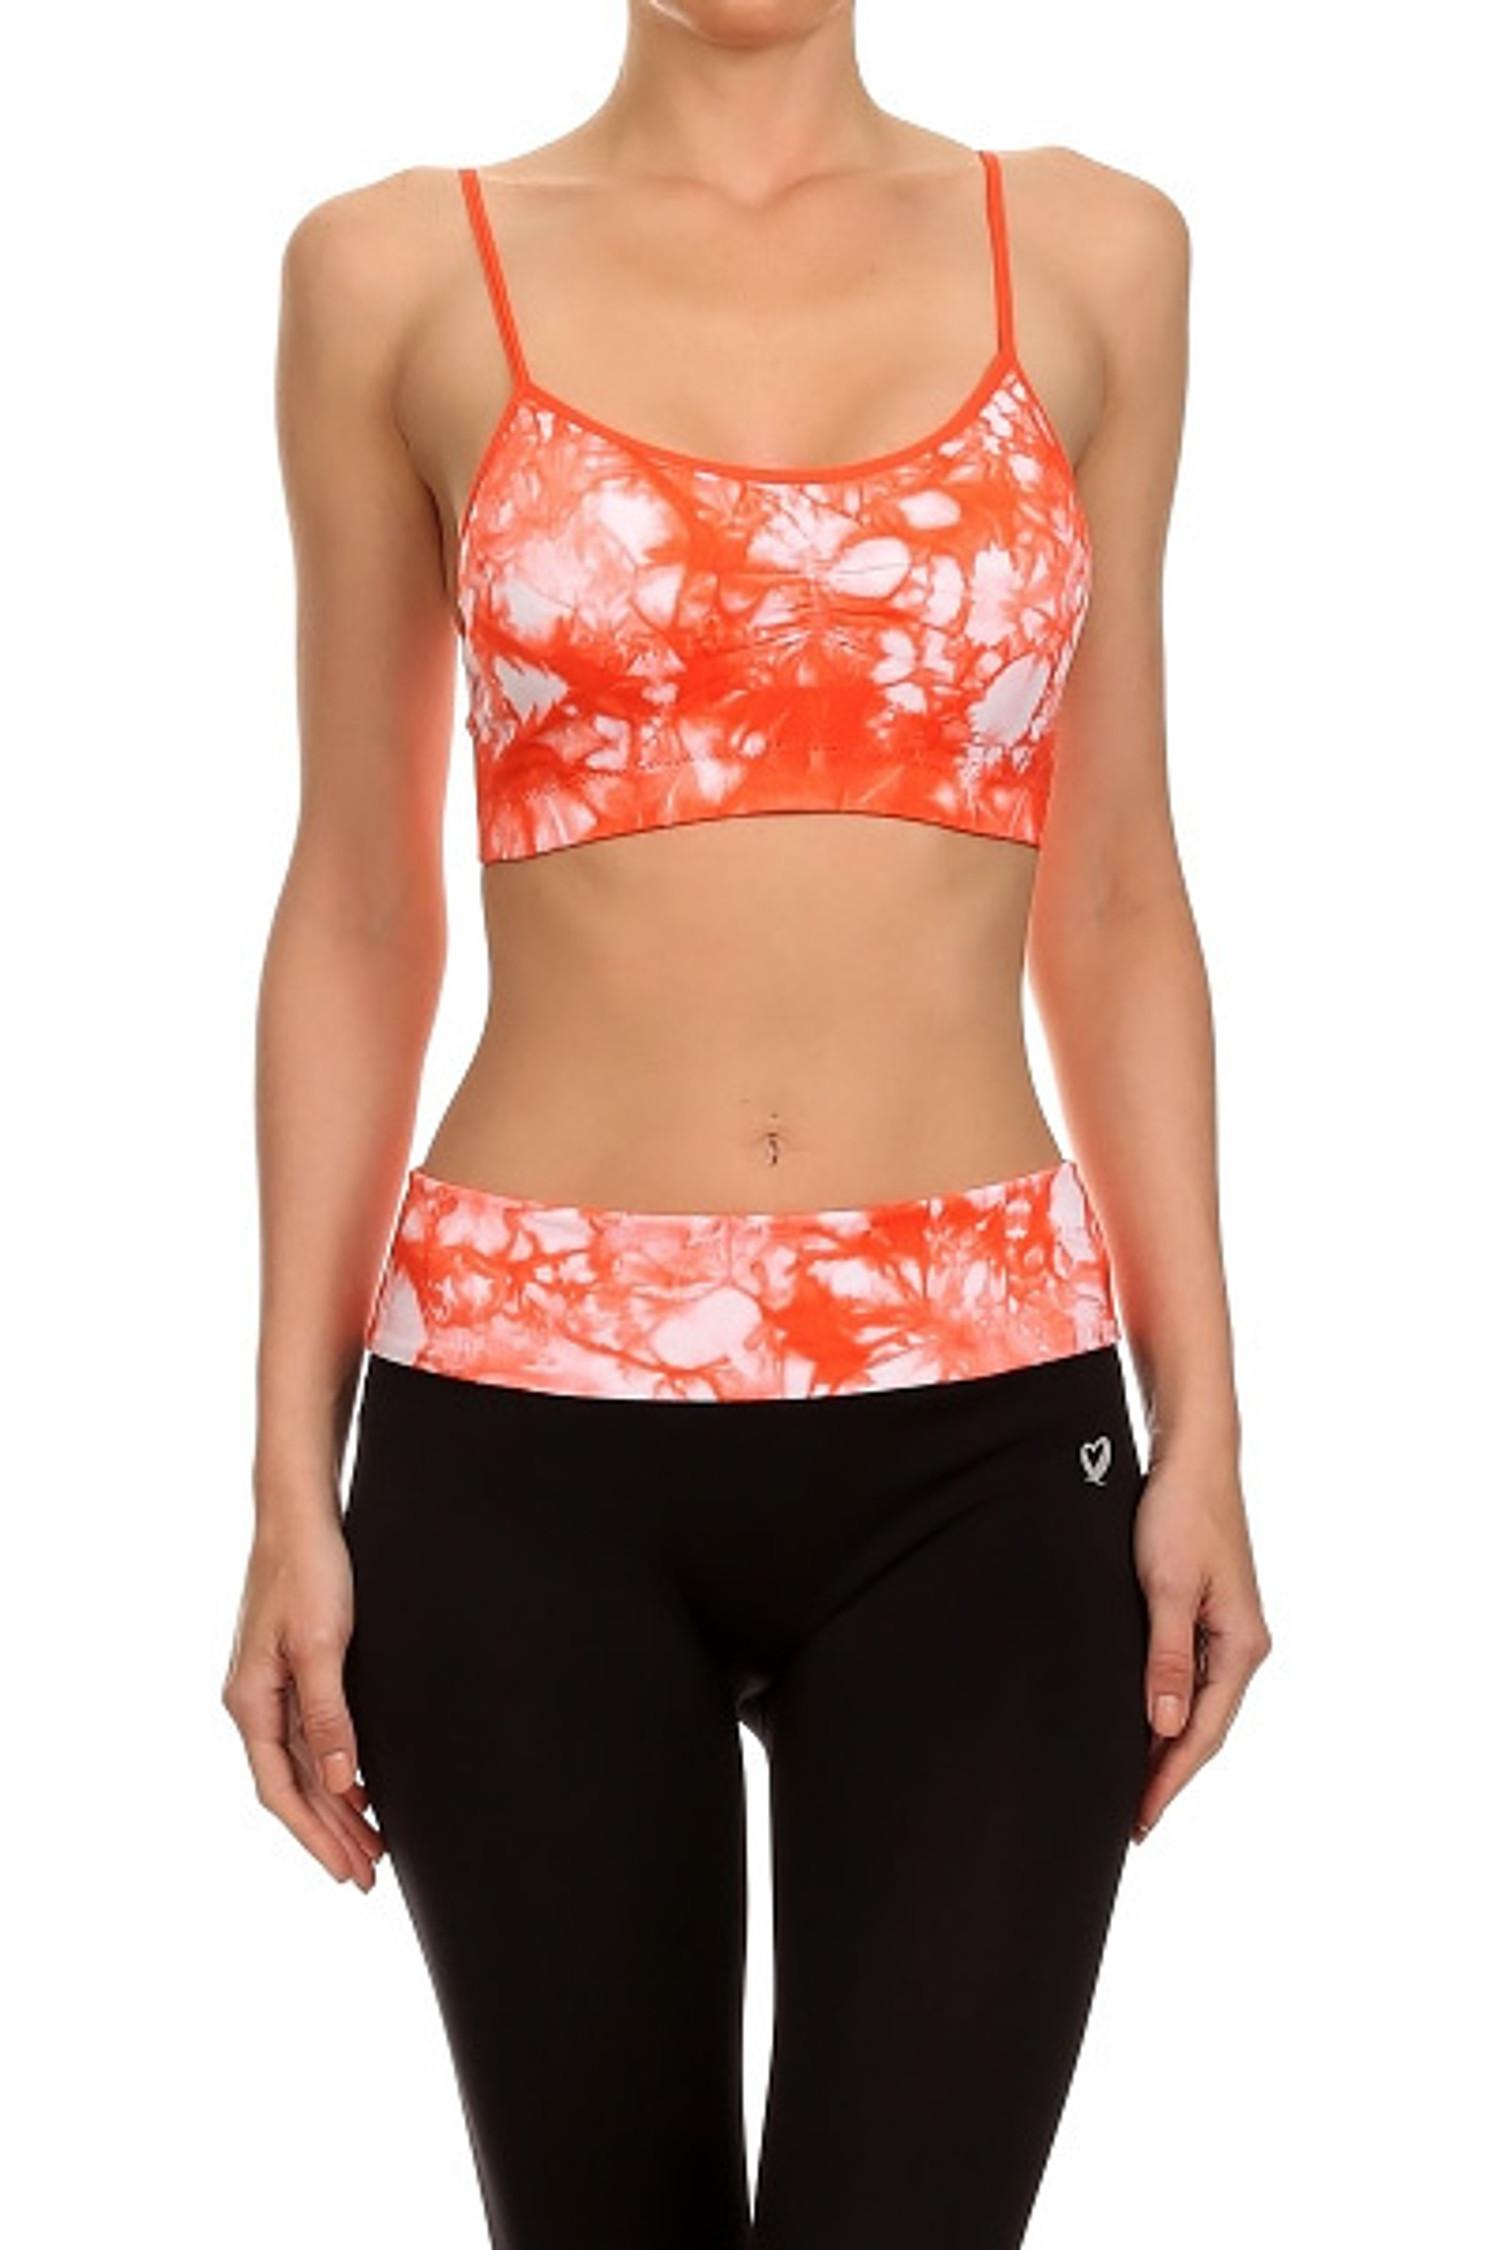 Coral Groovy Tie Dye Sports Bra